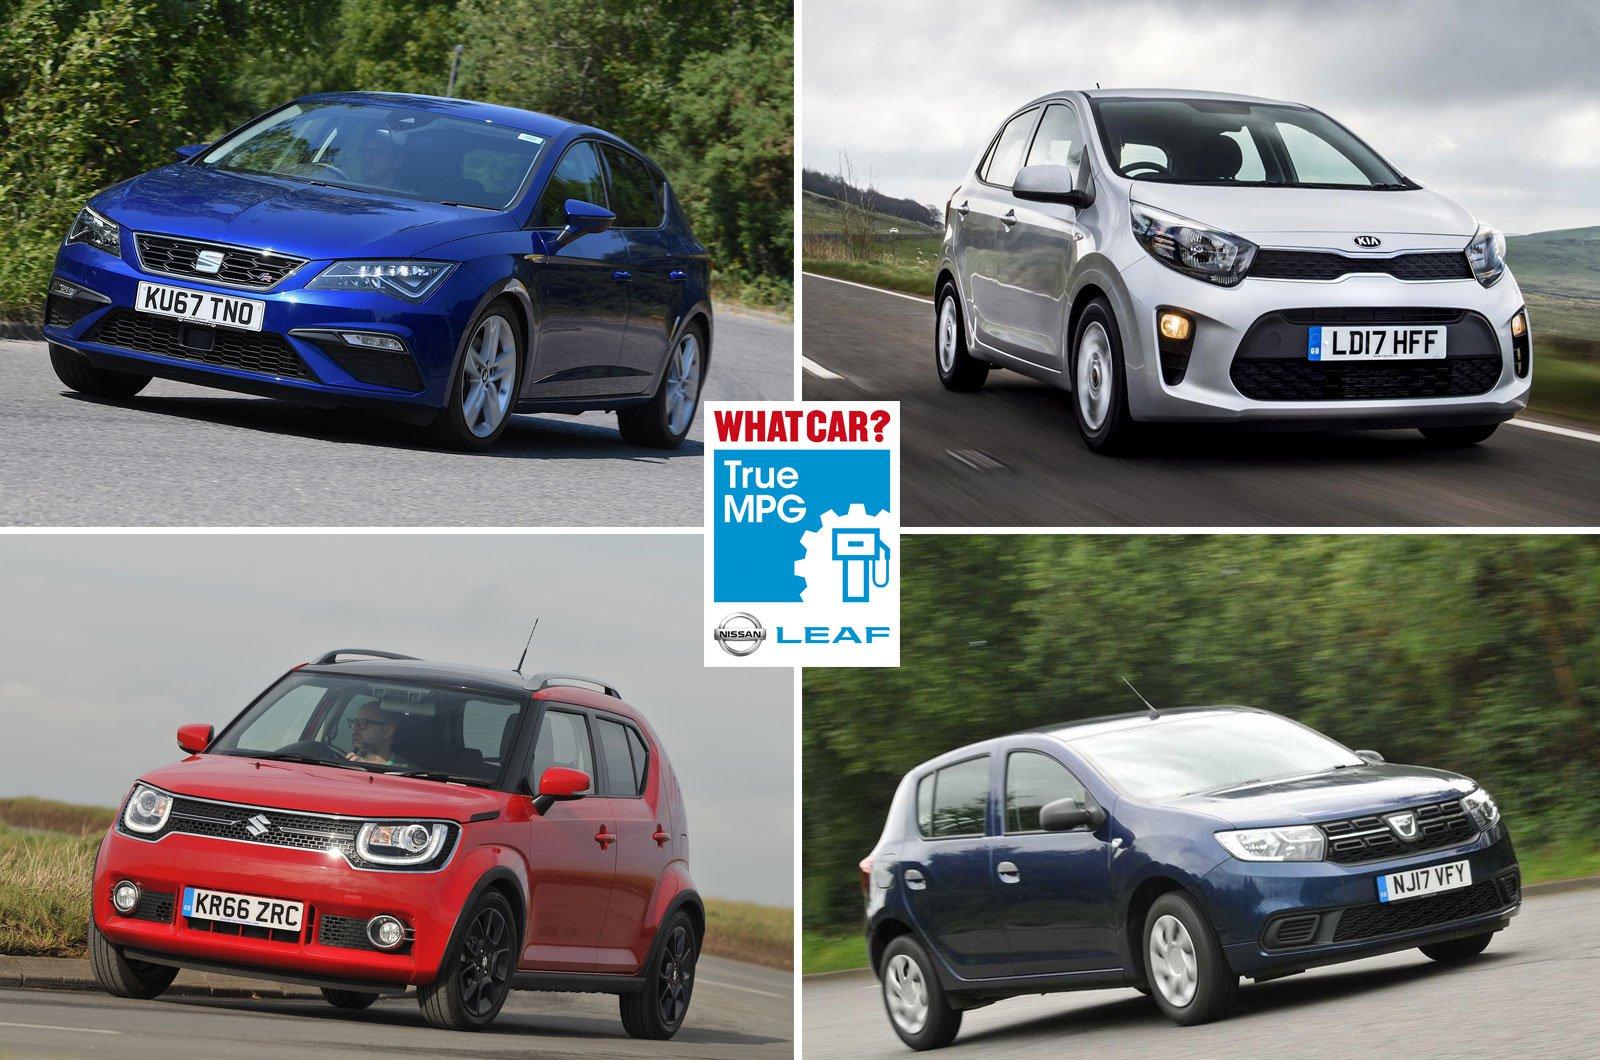 Seat Leon, Kia Picanto, Suzuki Ignis, Dacia Sandero